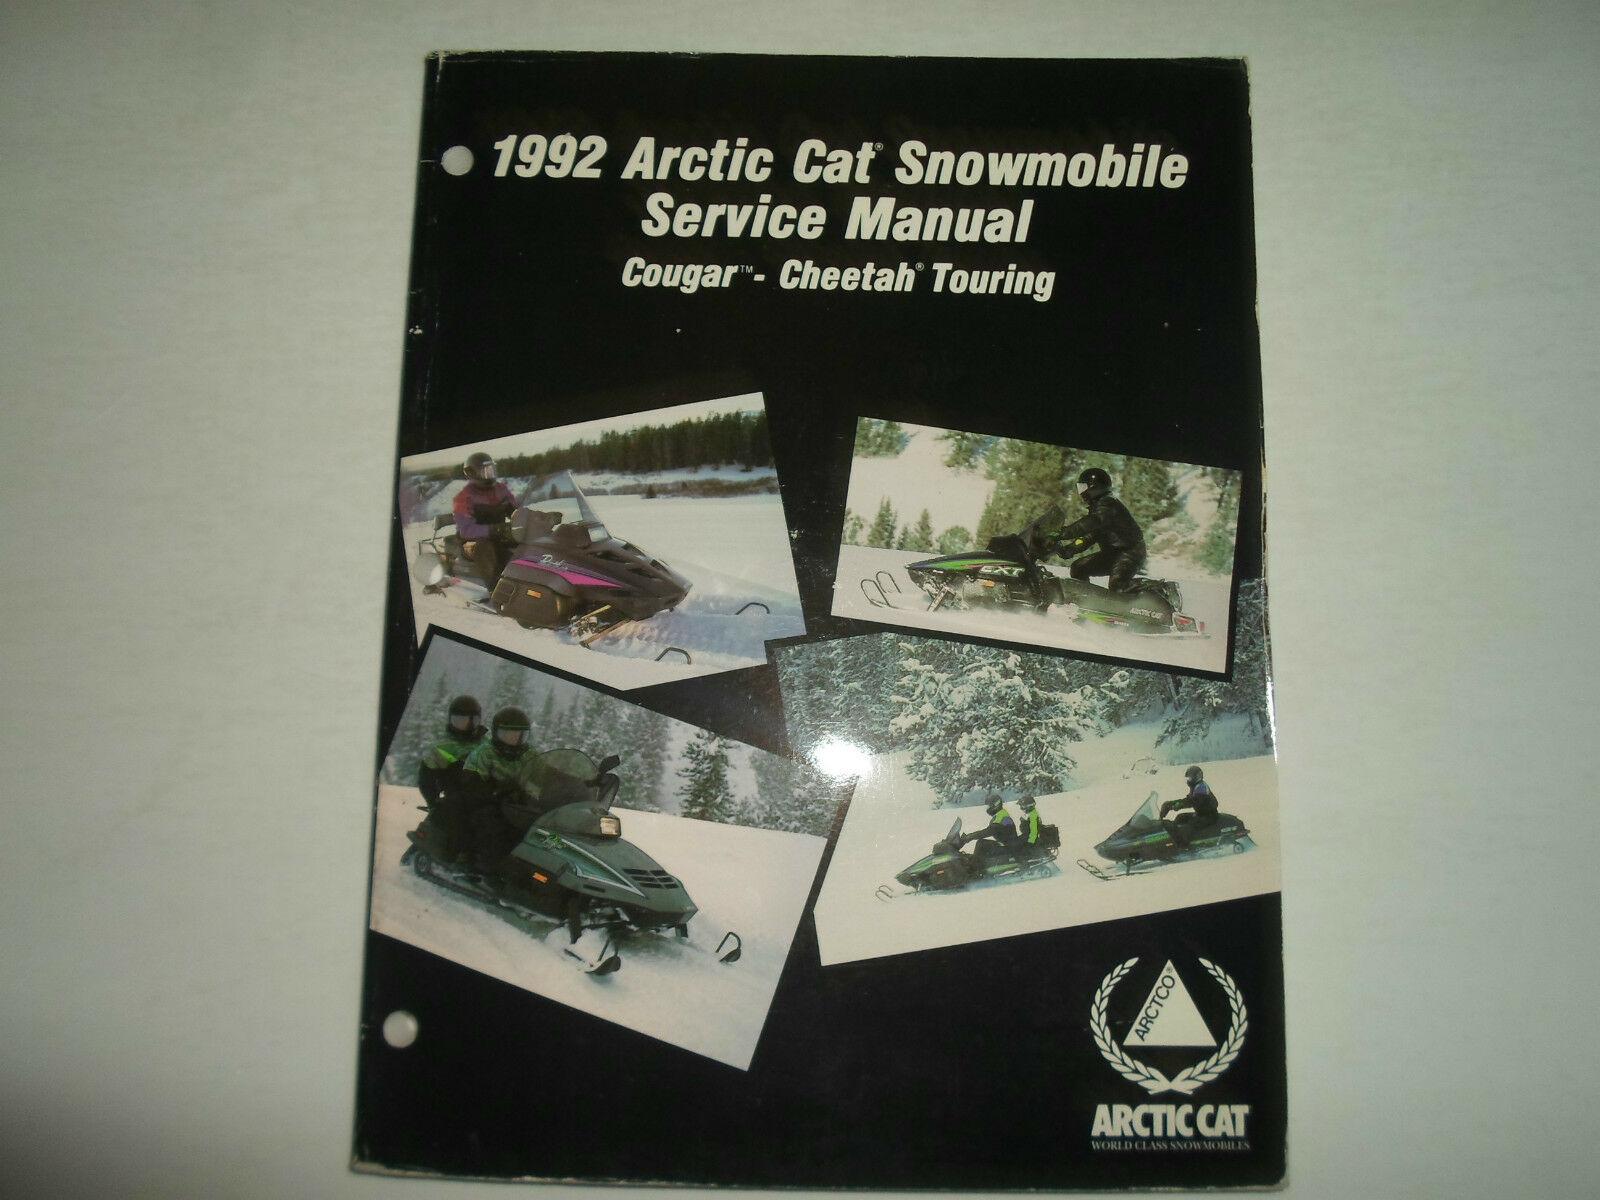 1992 Arctic Cat Cougar Cheetah Touring Service Repair Shop Manual WATER DAMAGED